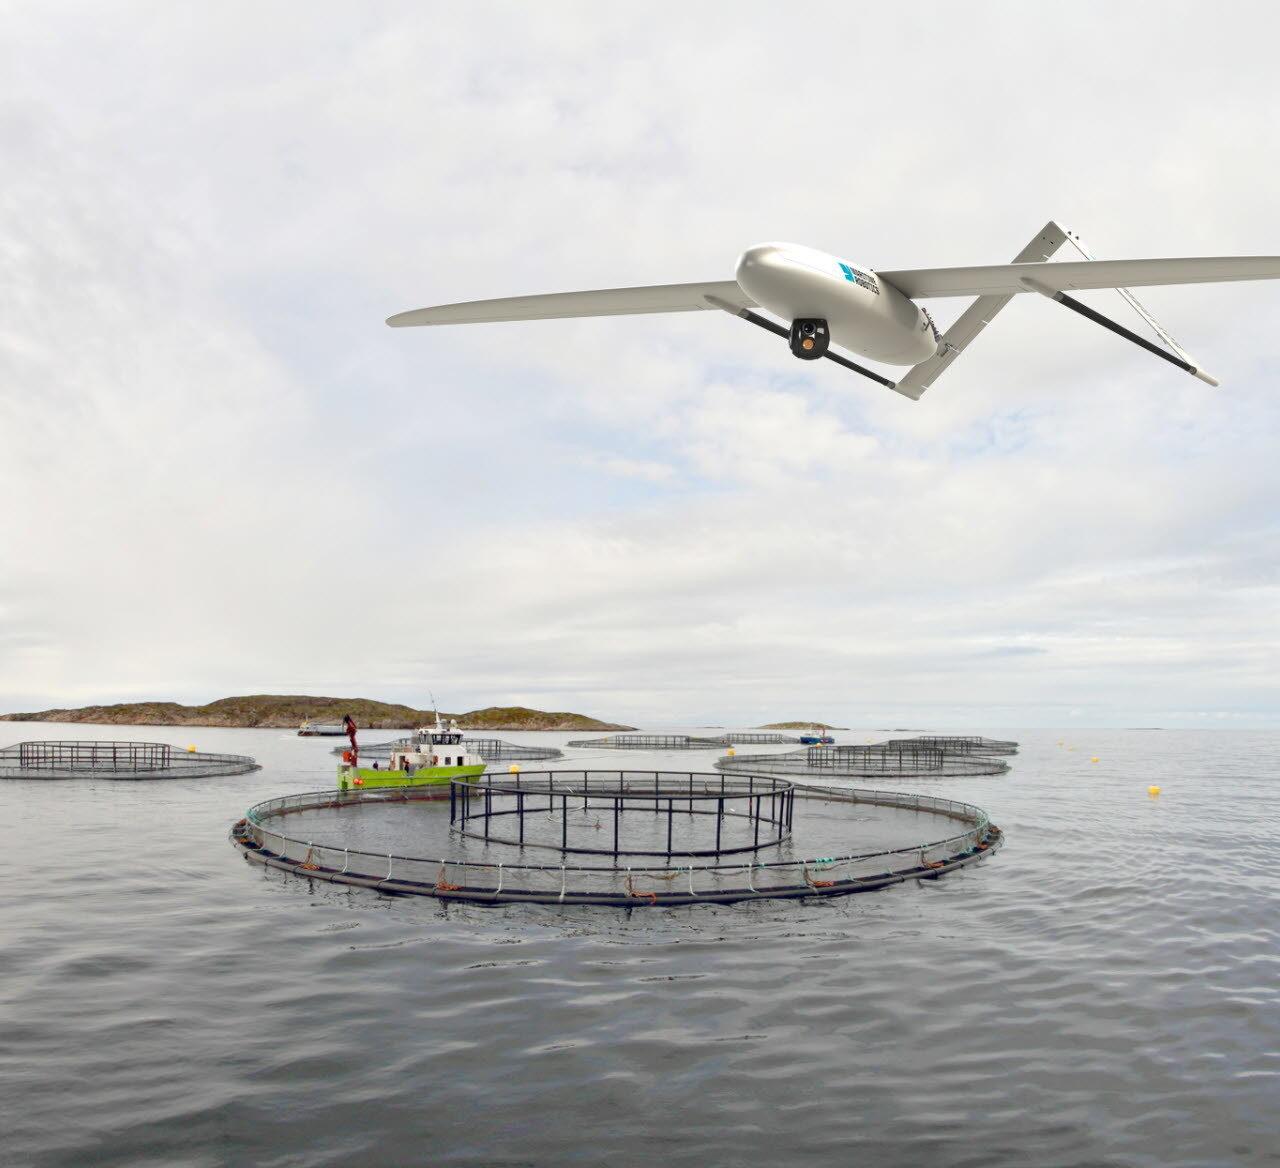 https://nextwavehellas.com/wp-content/uploads/2020/10/aquaculture-1-1280x1168.jpg